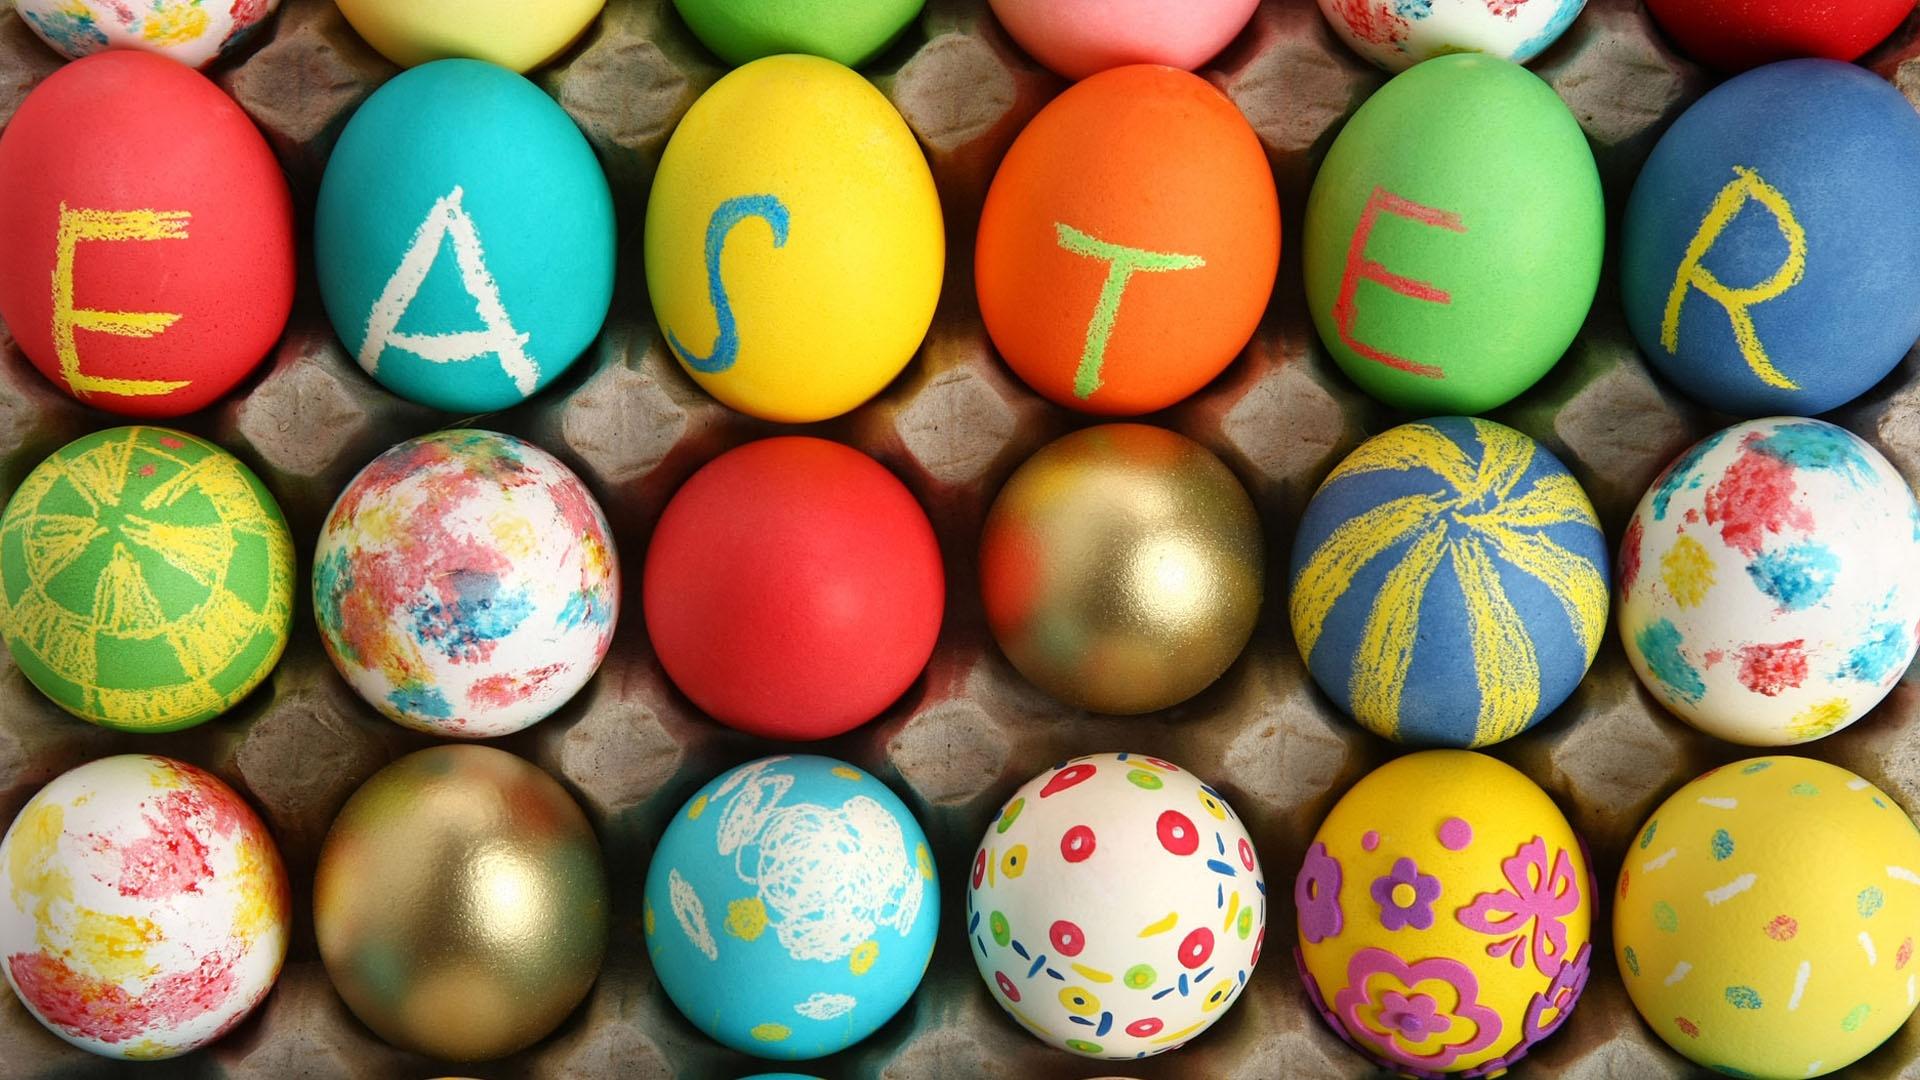 Buona Pasqua da Gamesblog